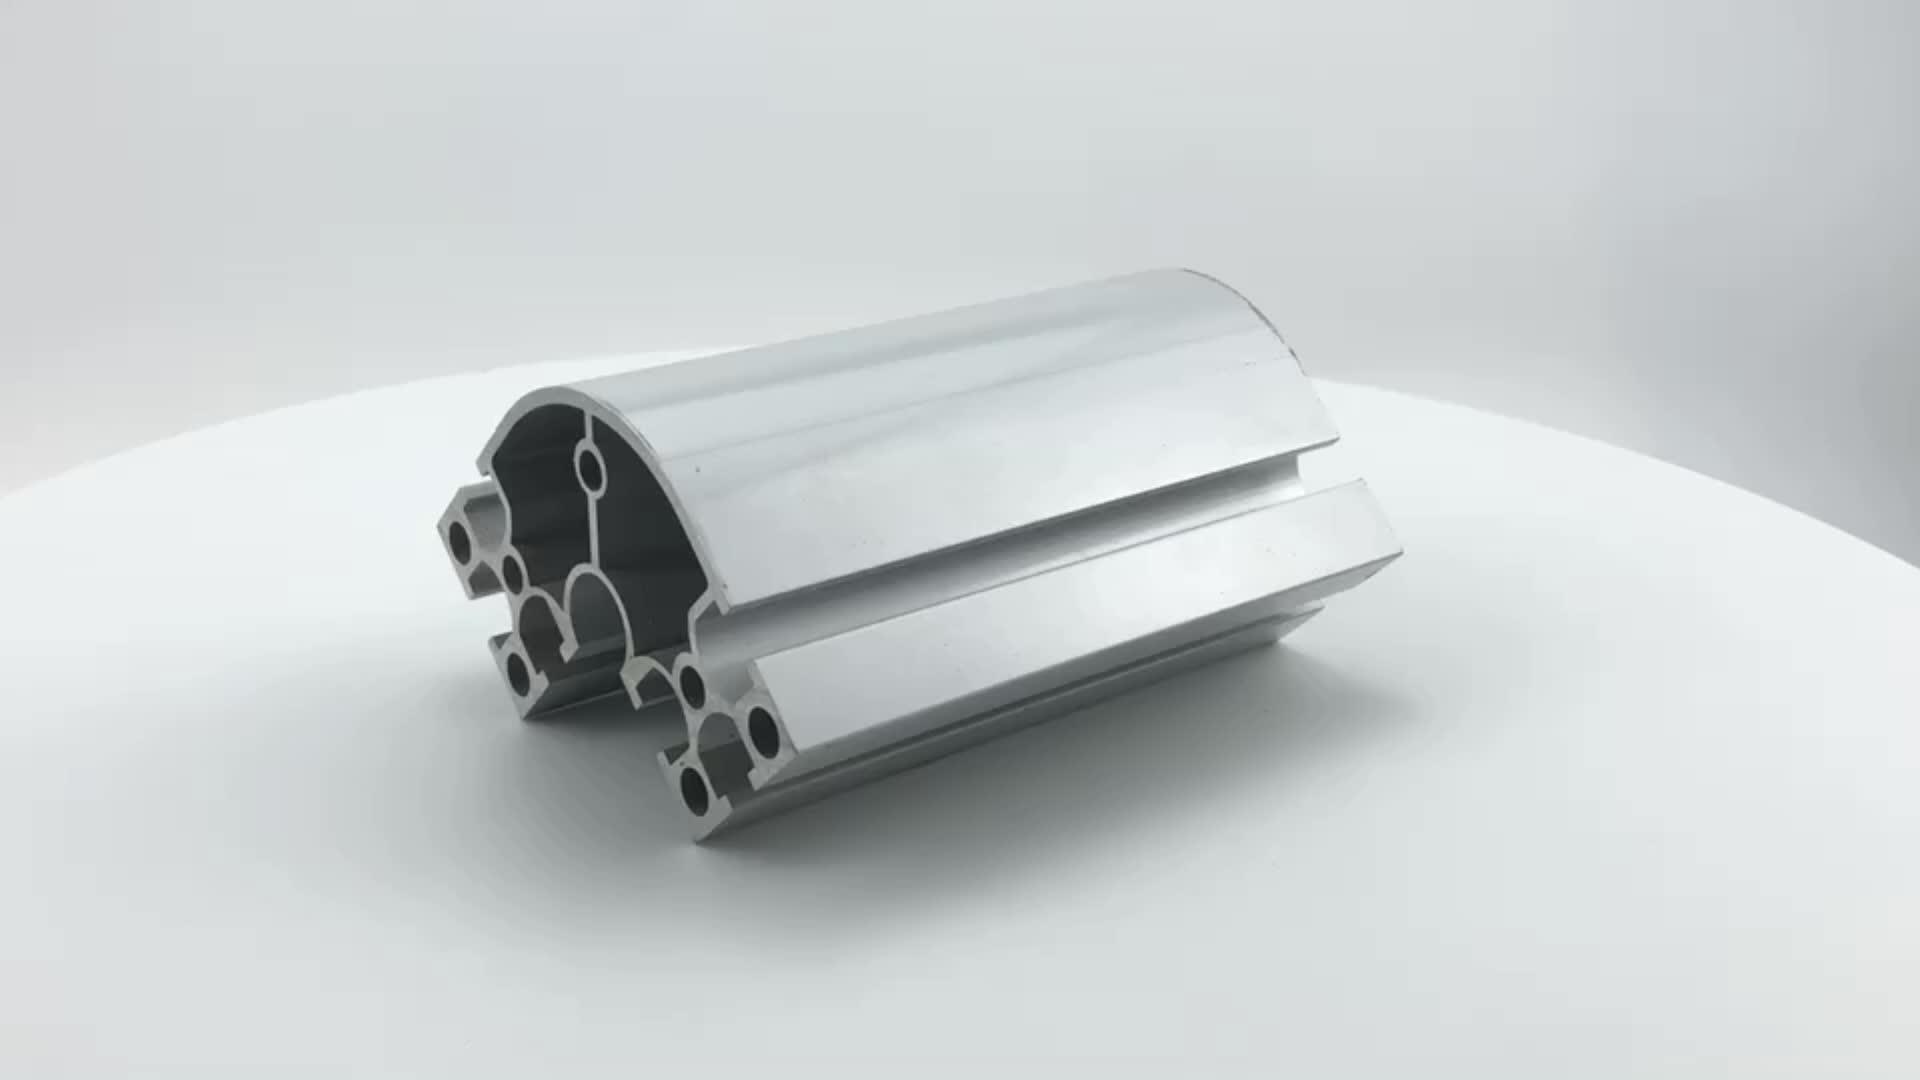 Custom V slot T slot 6061 t6 industrial aluminum profile prices per kg